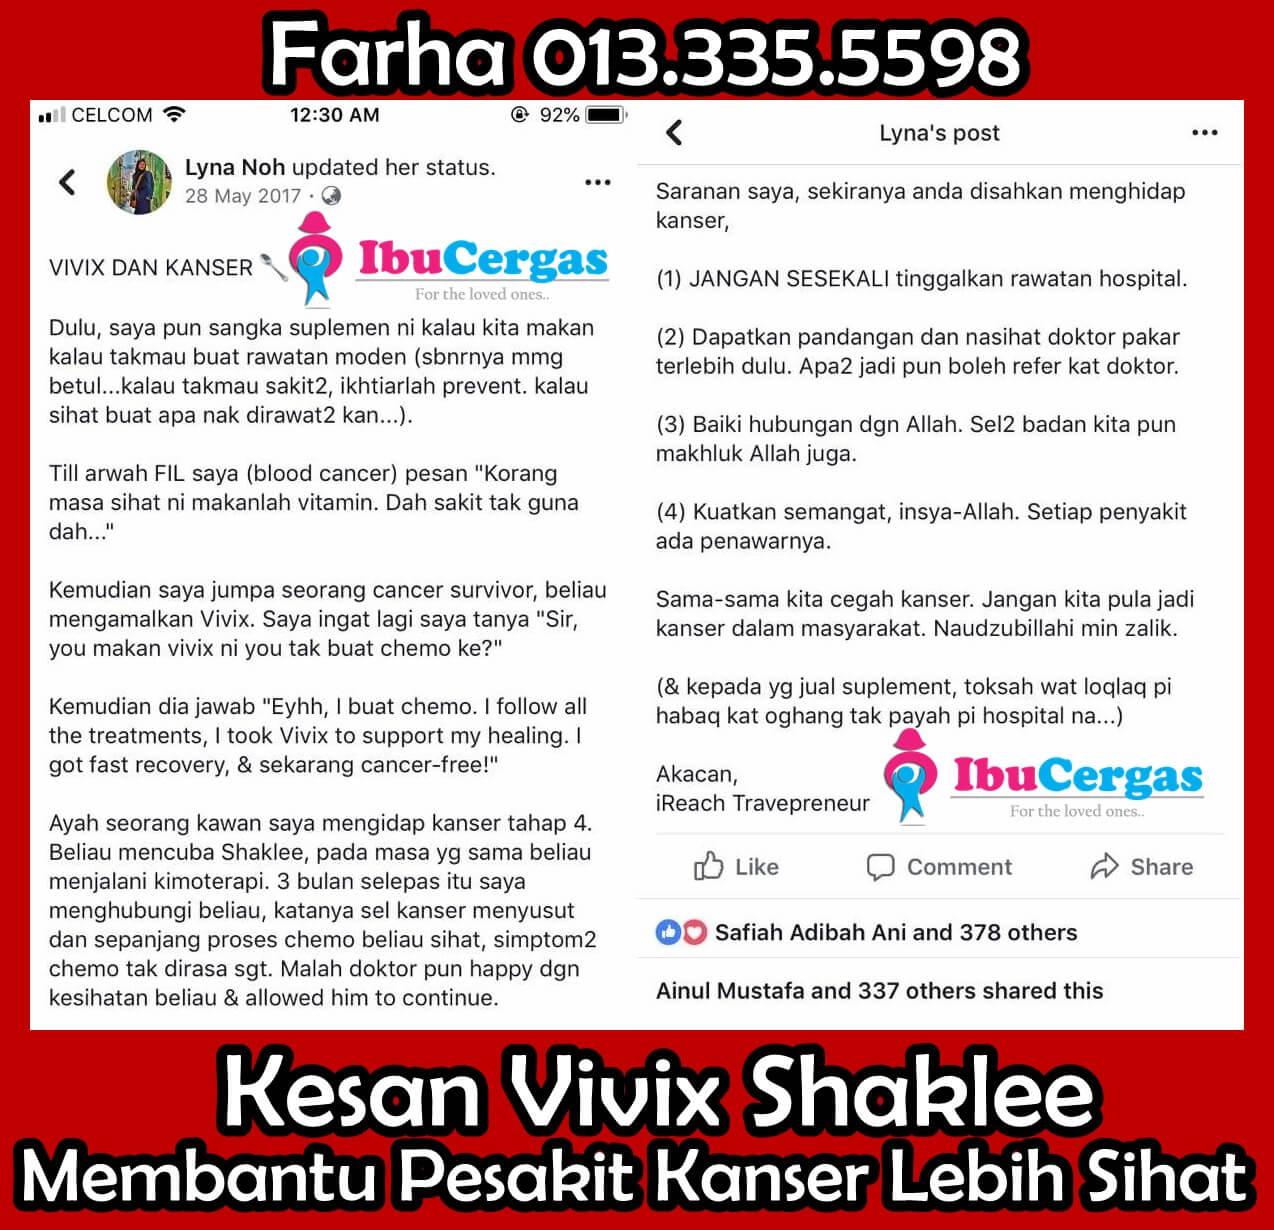 Testimoni Vivix Untuk Kanser - Kebaikan Vivix Untuk Kanser 6-vert